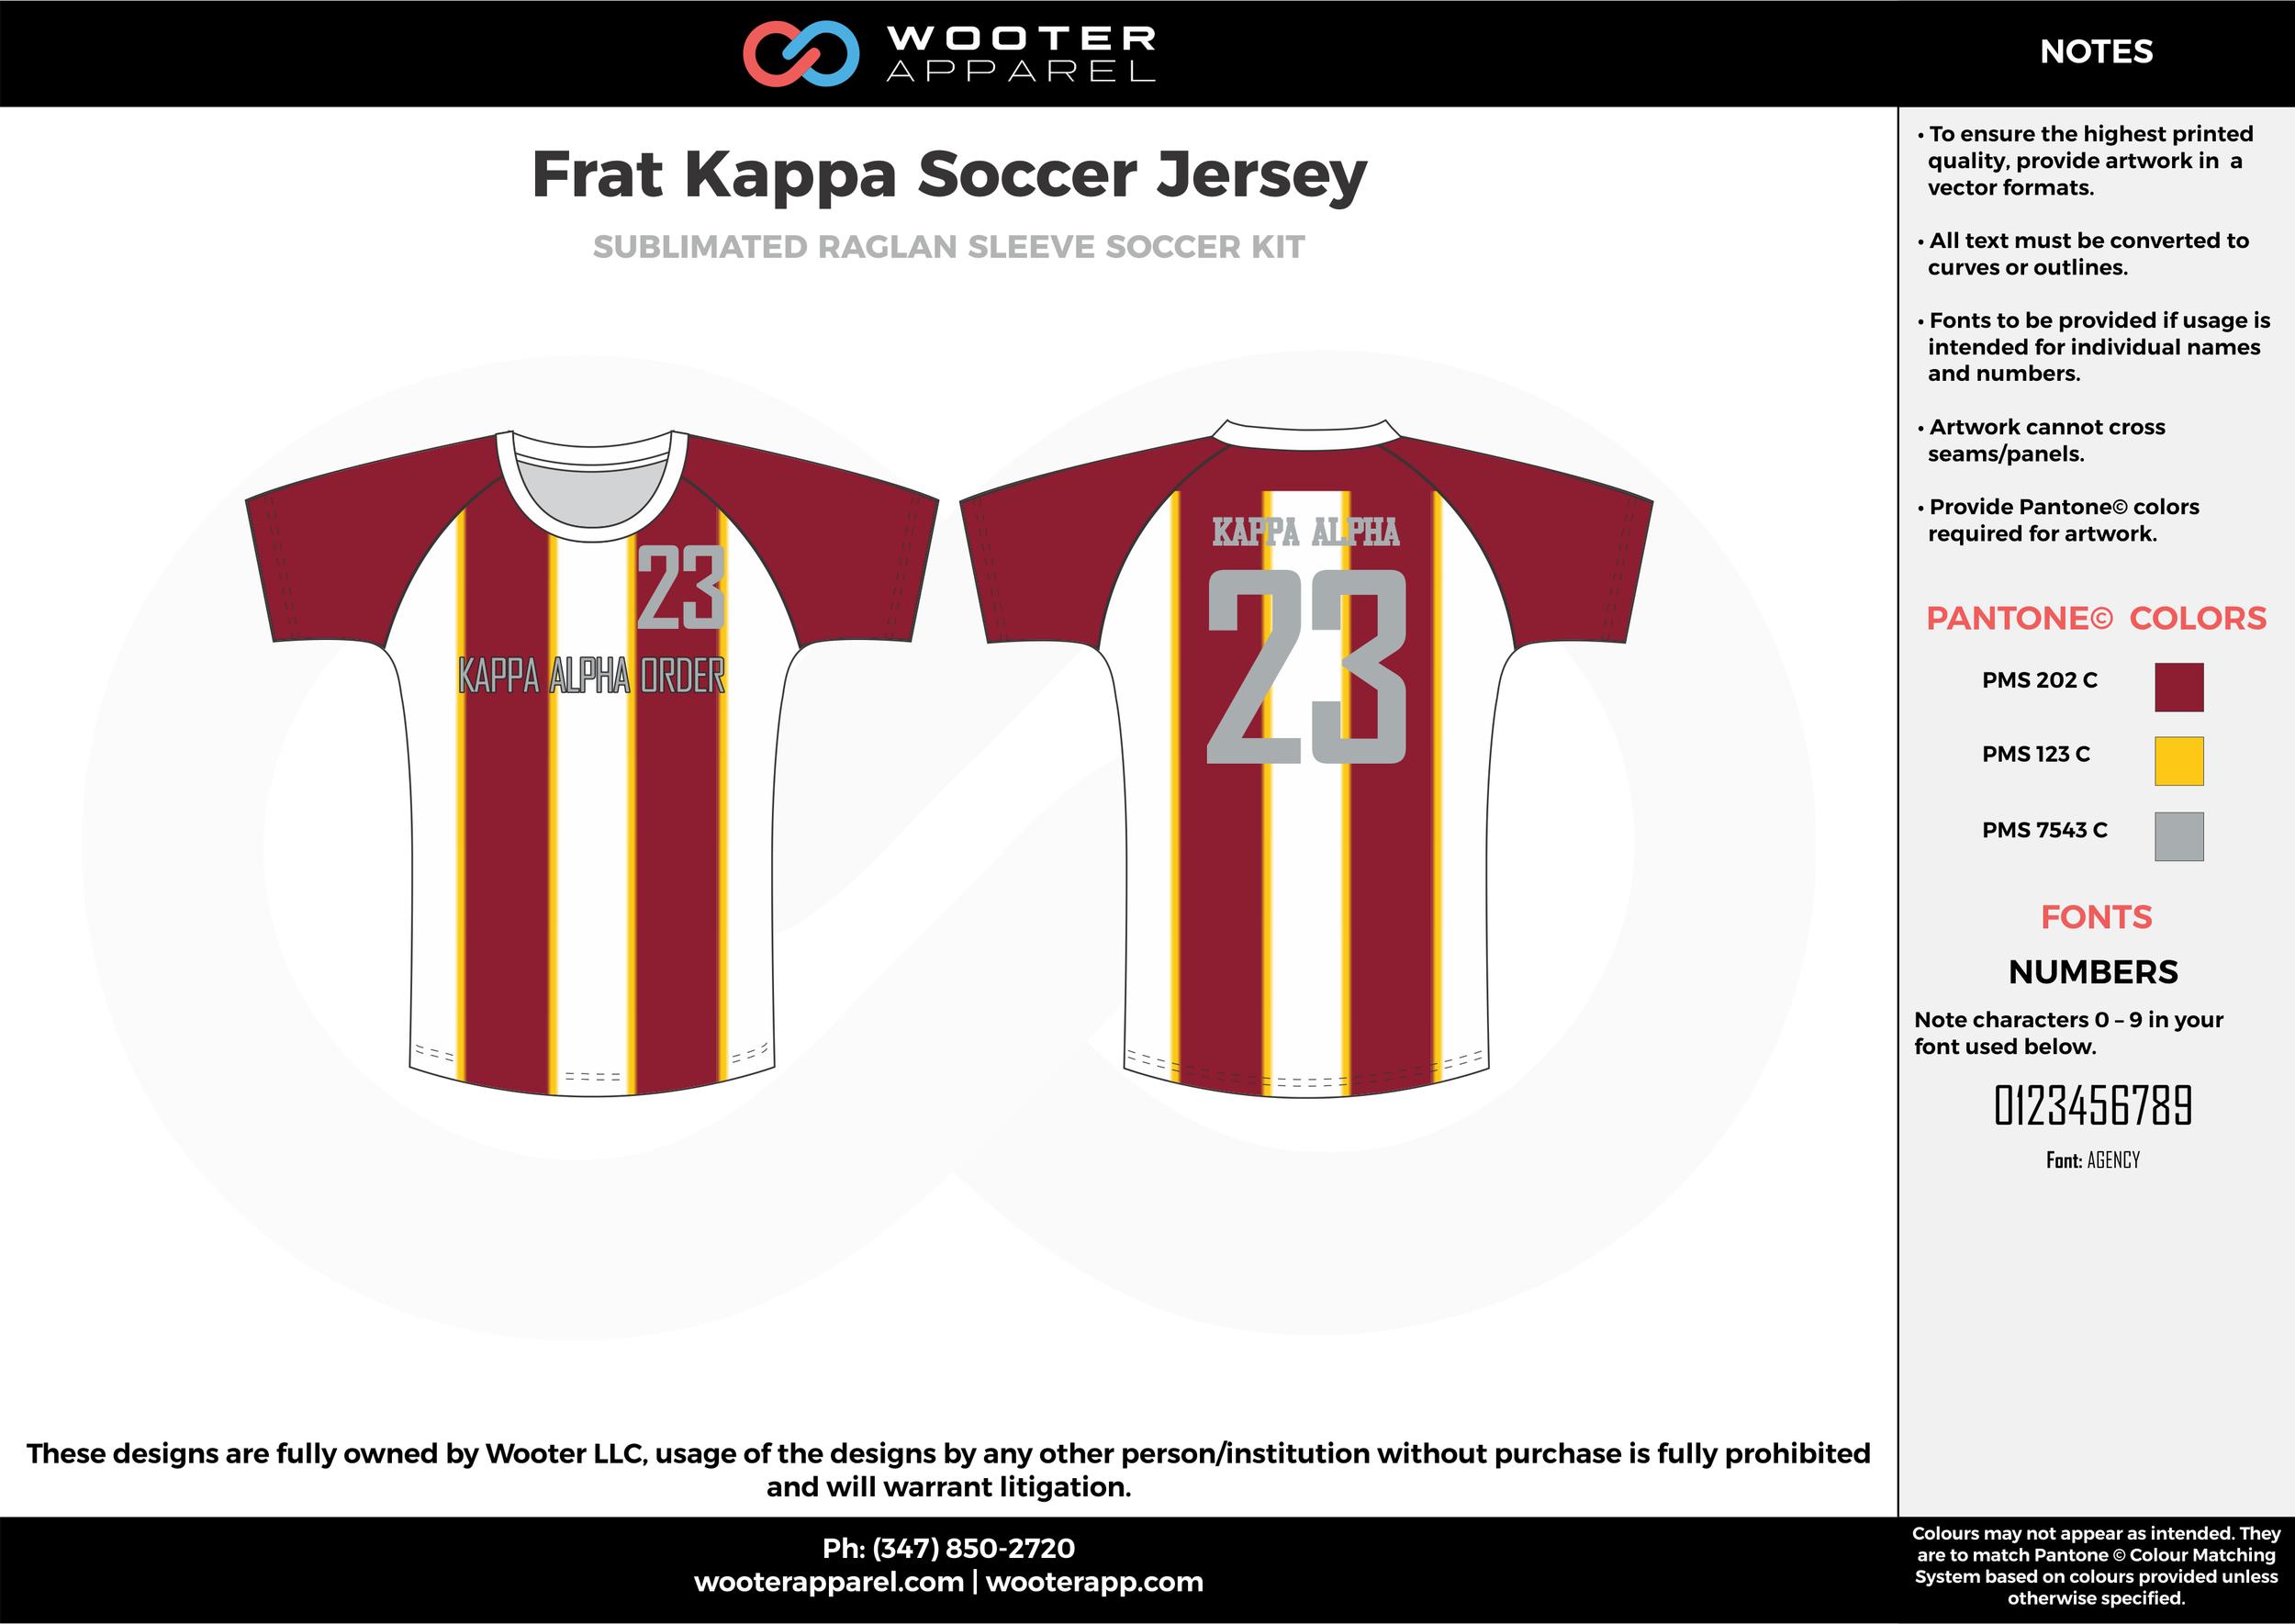 Frat Kappa maroon yellow white custom sublimated soccer uniform jersey shirt